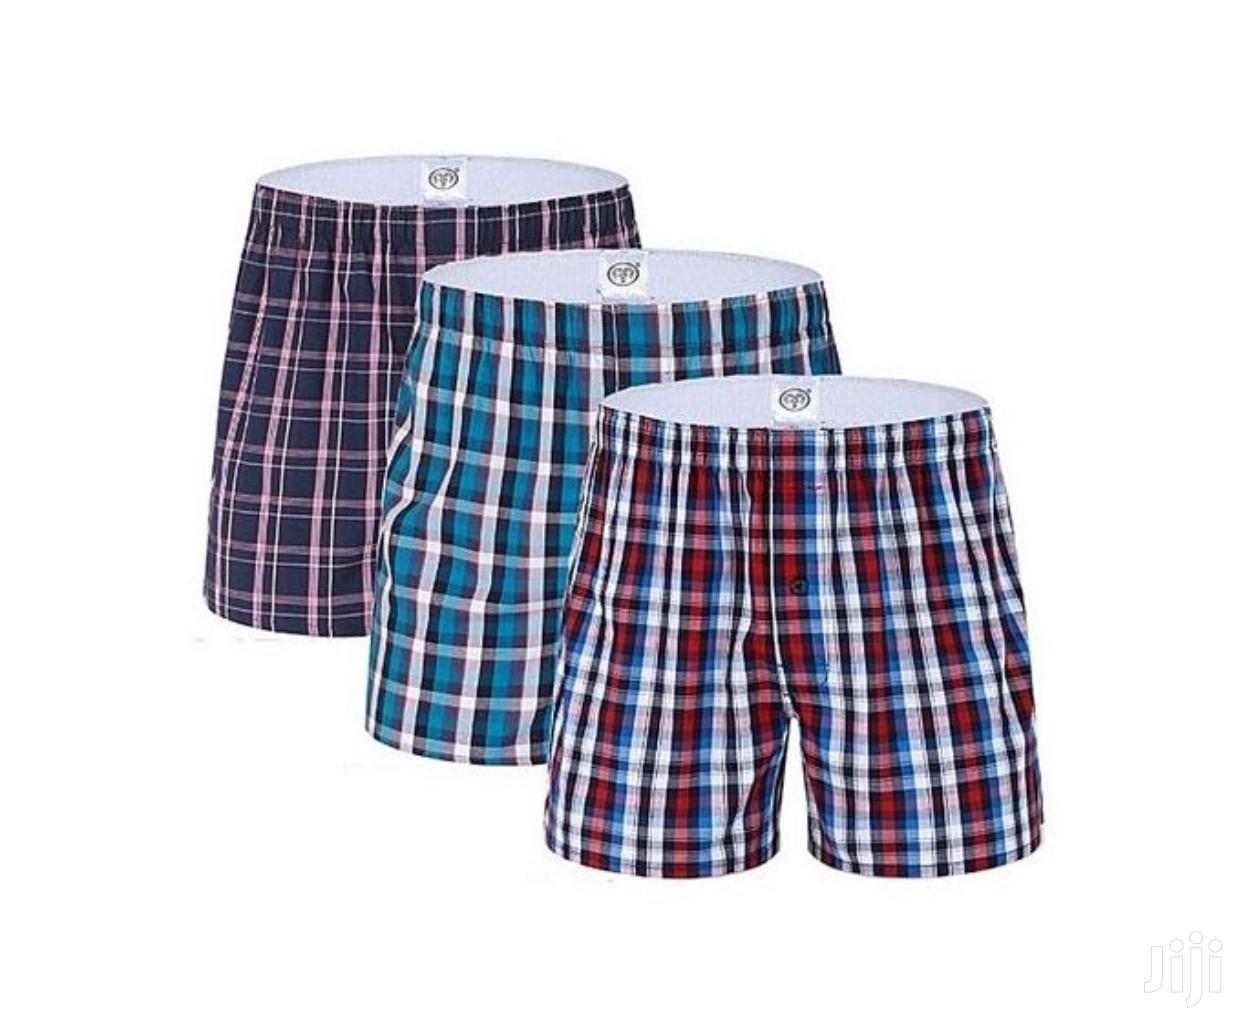 3 in 1 Men Cotton Boxers   Clothing for sale in Nairobi Central, Nairobi, Kenya